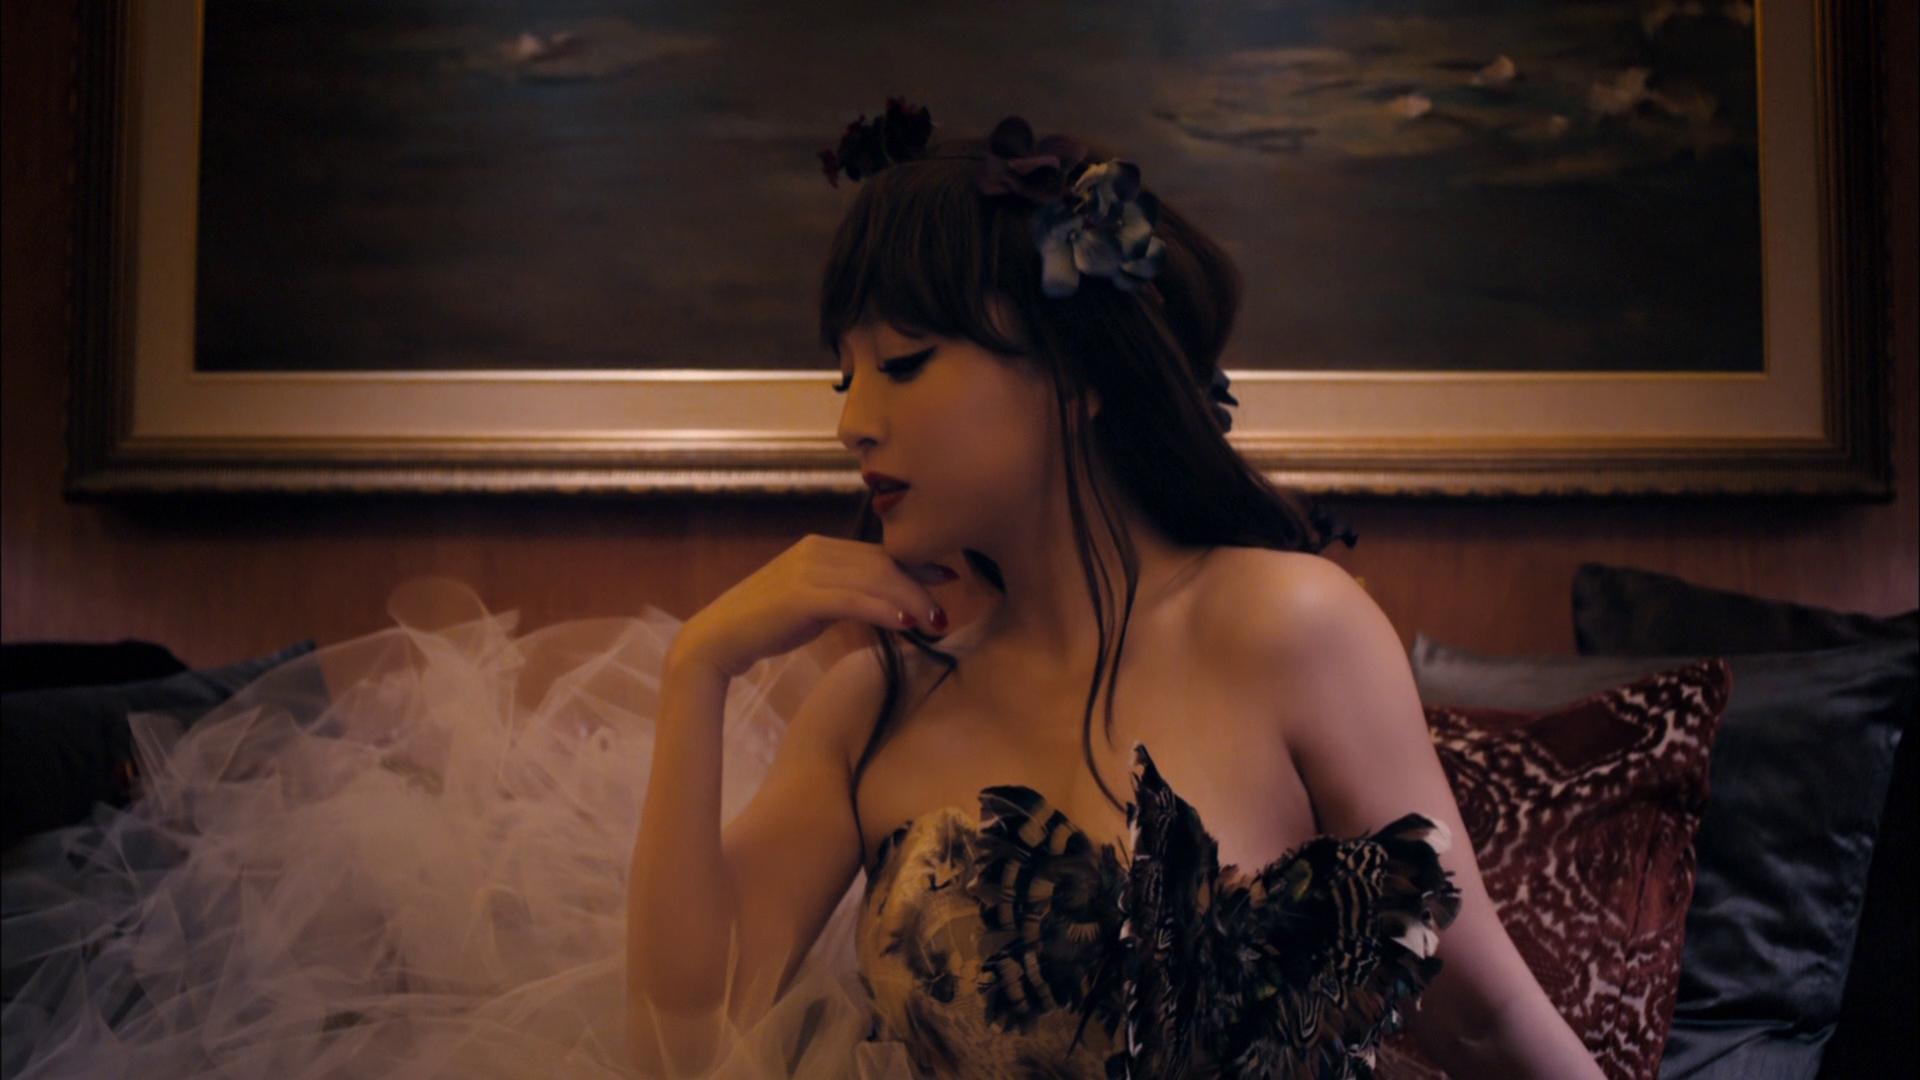 20161104.03.40 Ayumi Hamasaki - Flower (PV) (Blu-Ray HD) (JPOP.ru).jpg